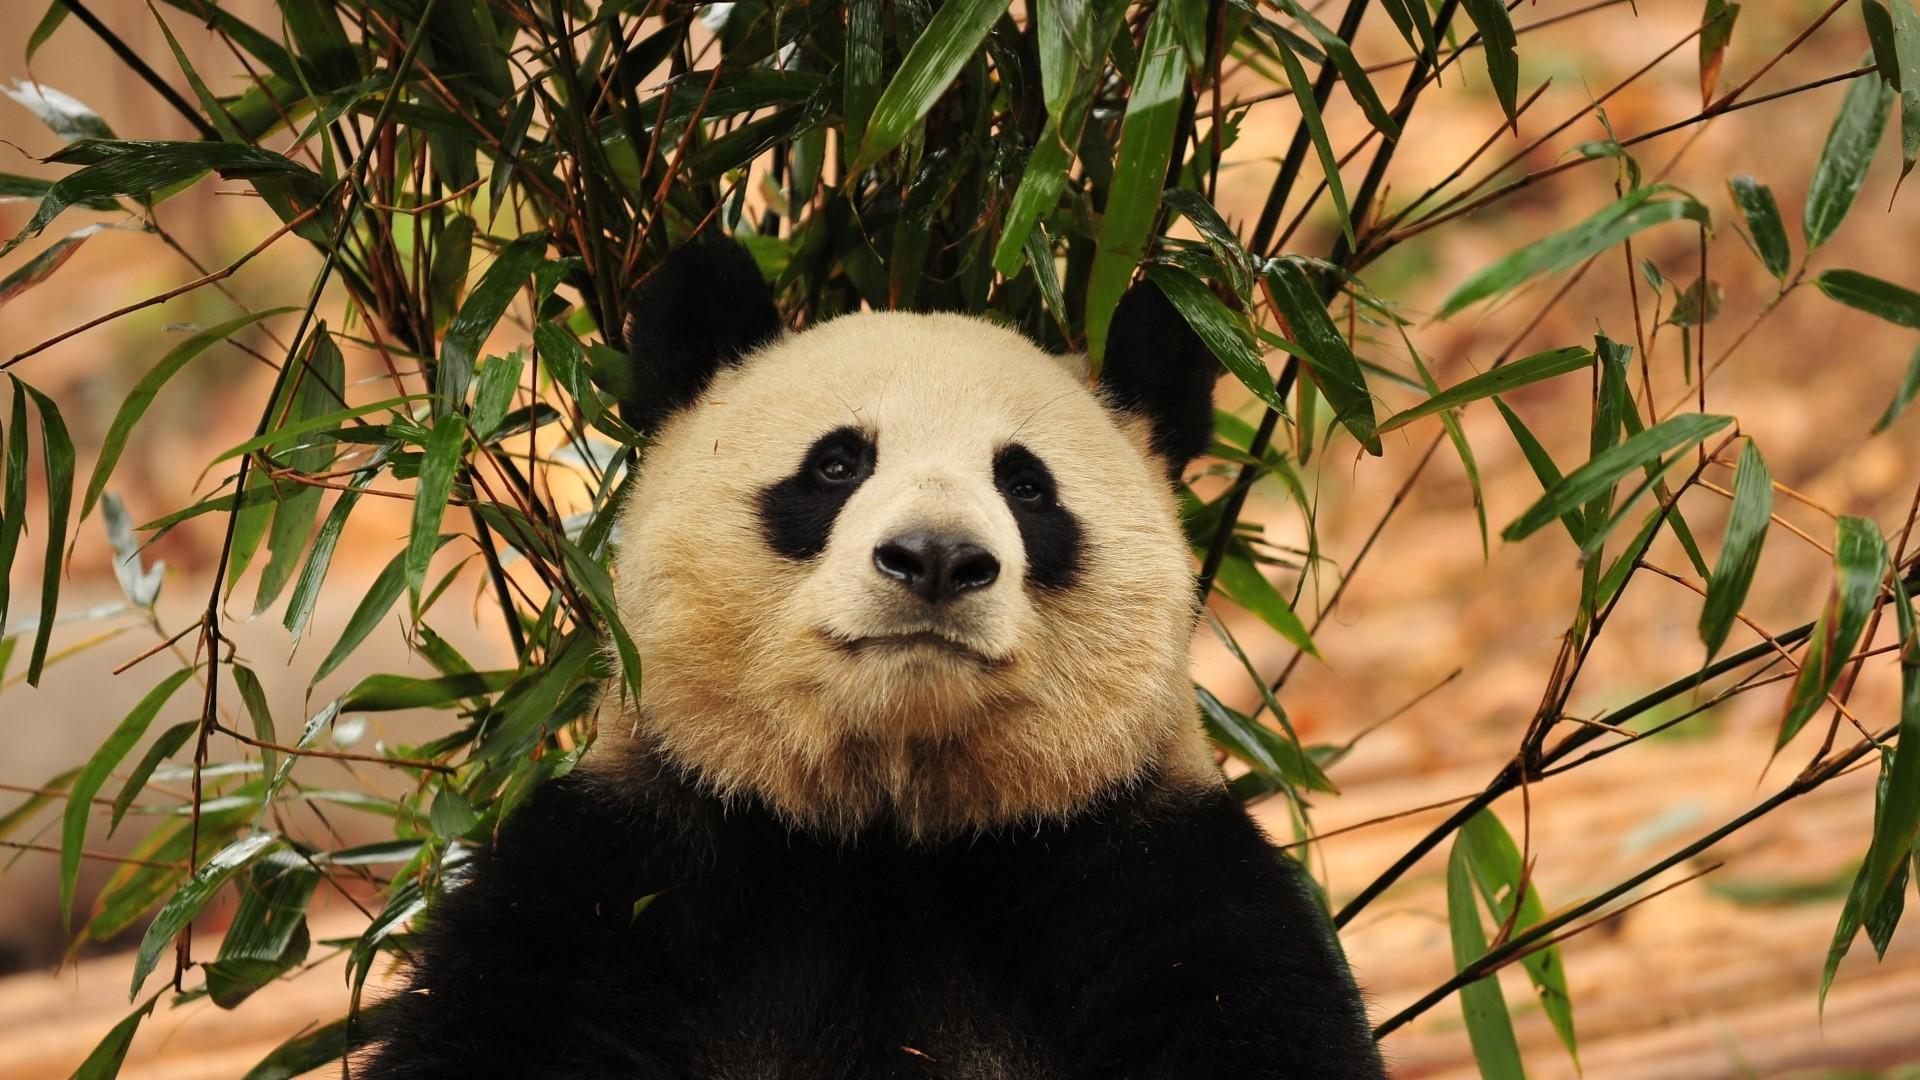 hinh gau truc panda 17